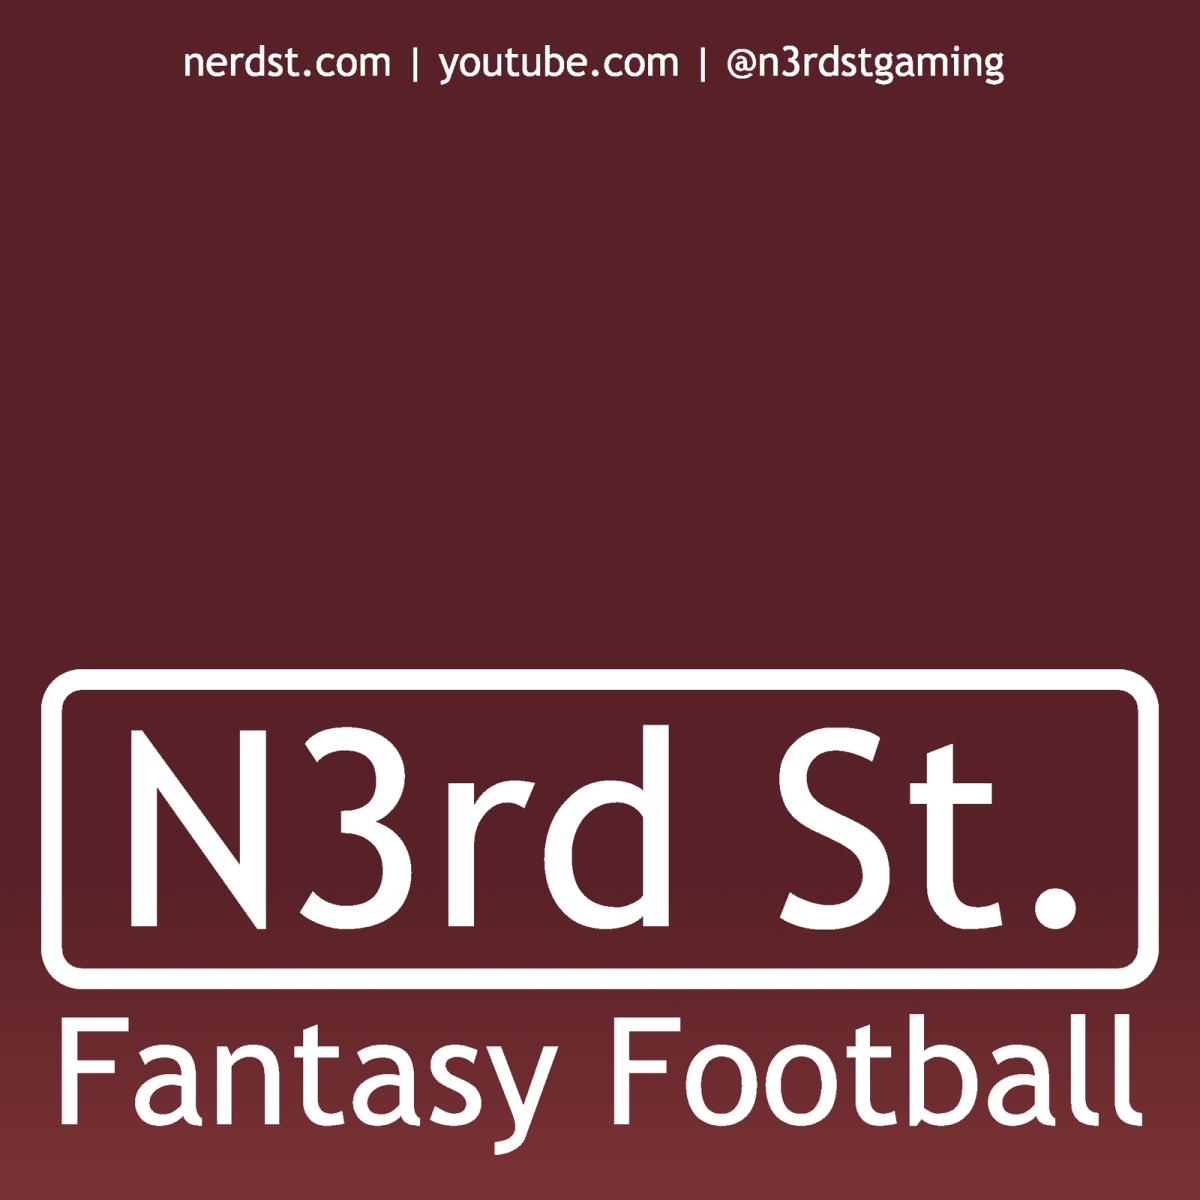 Nerd Street FF - N3rd St.